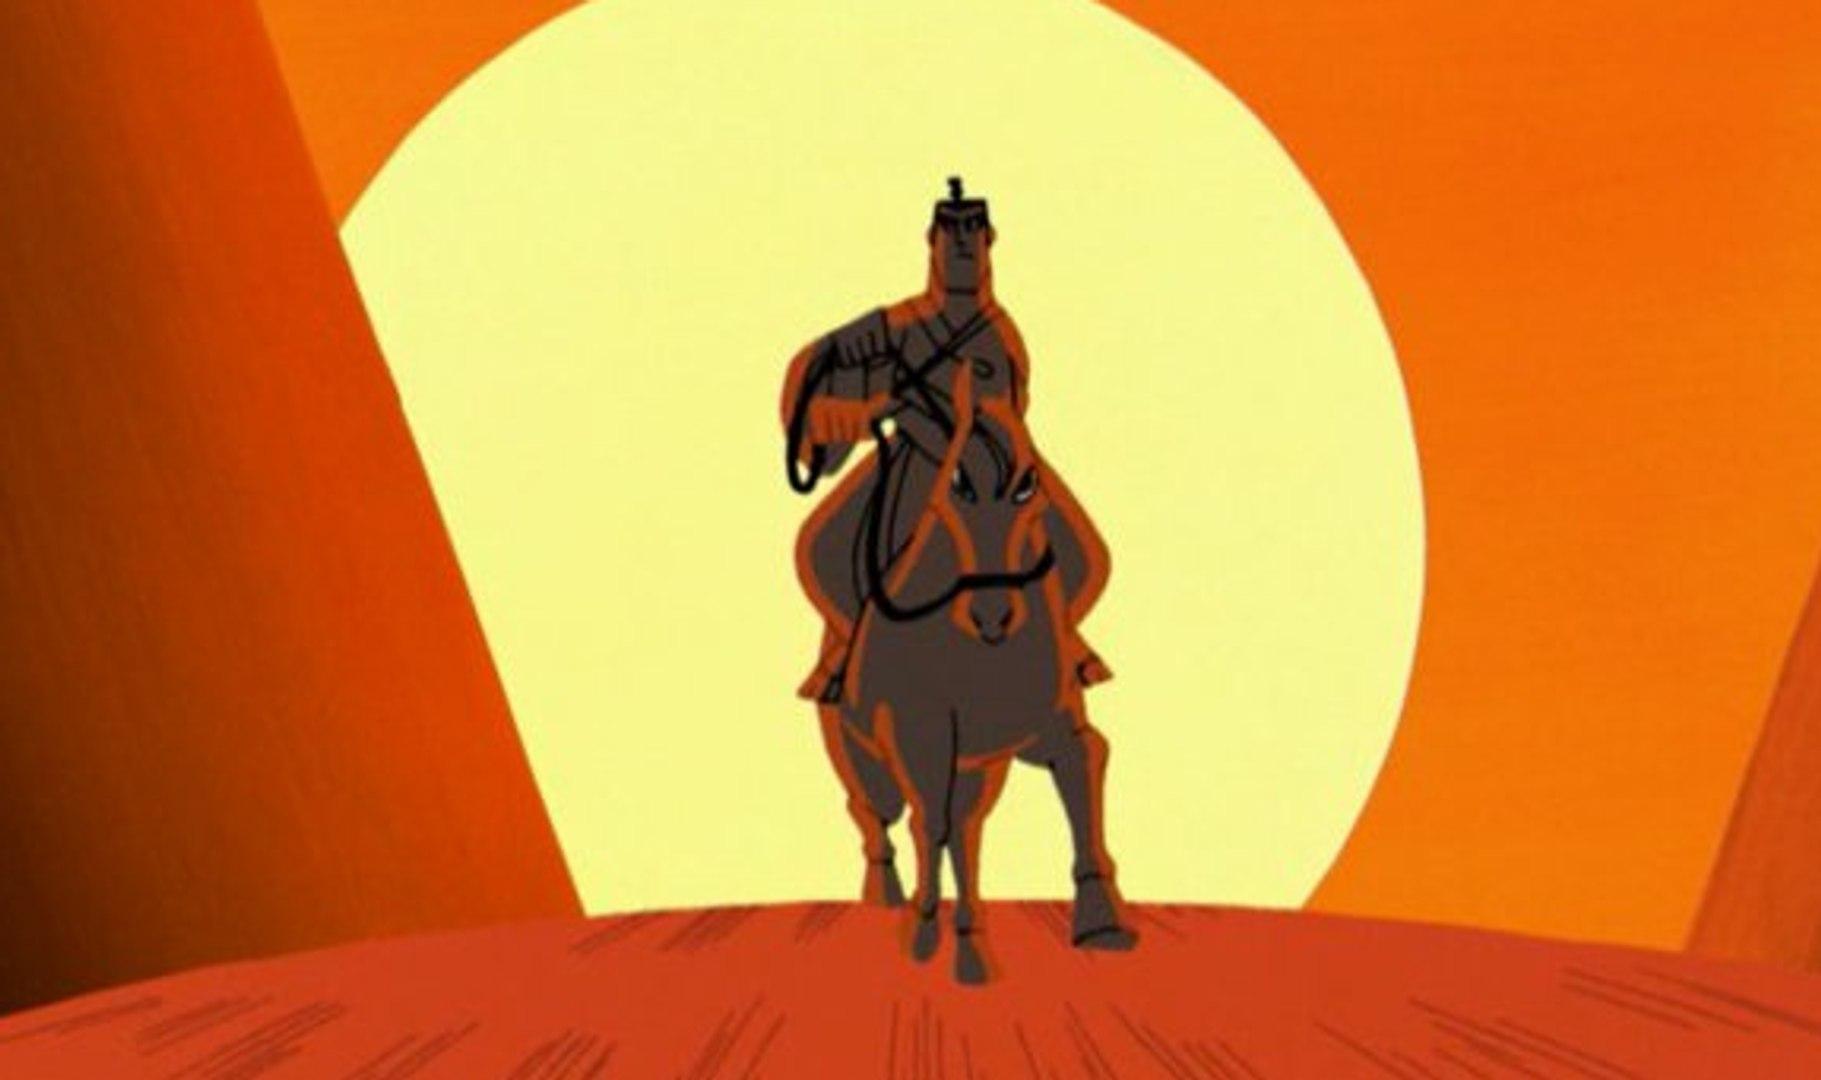 Samurai Jack Season 5 Episode 2 - XCIII - { S5/E2 } Full Episode Free Download,